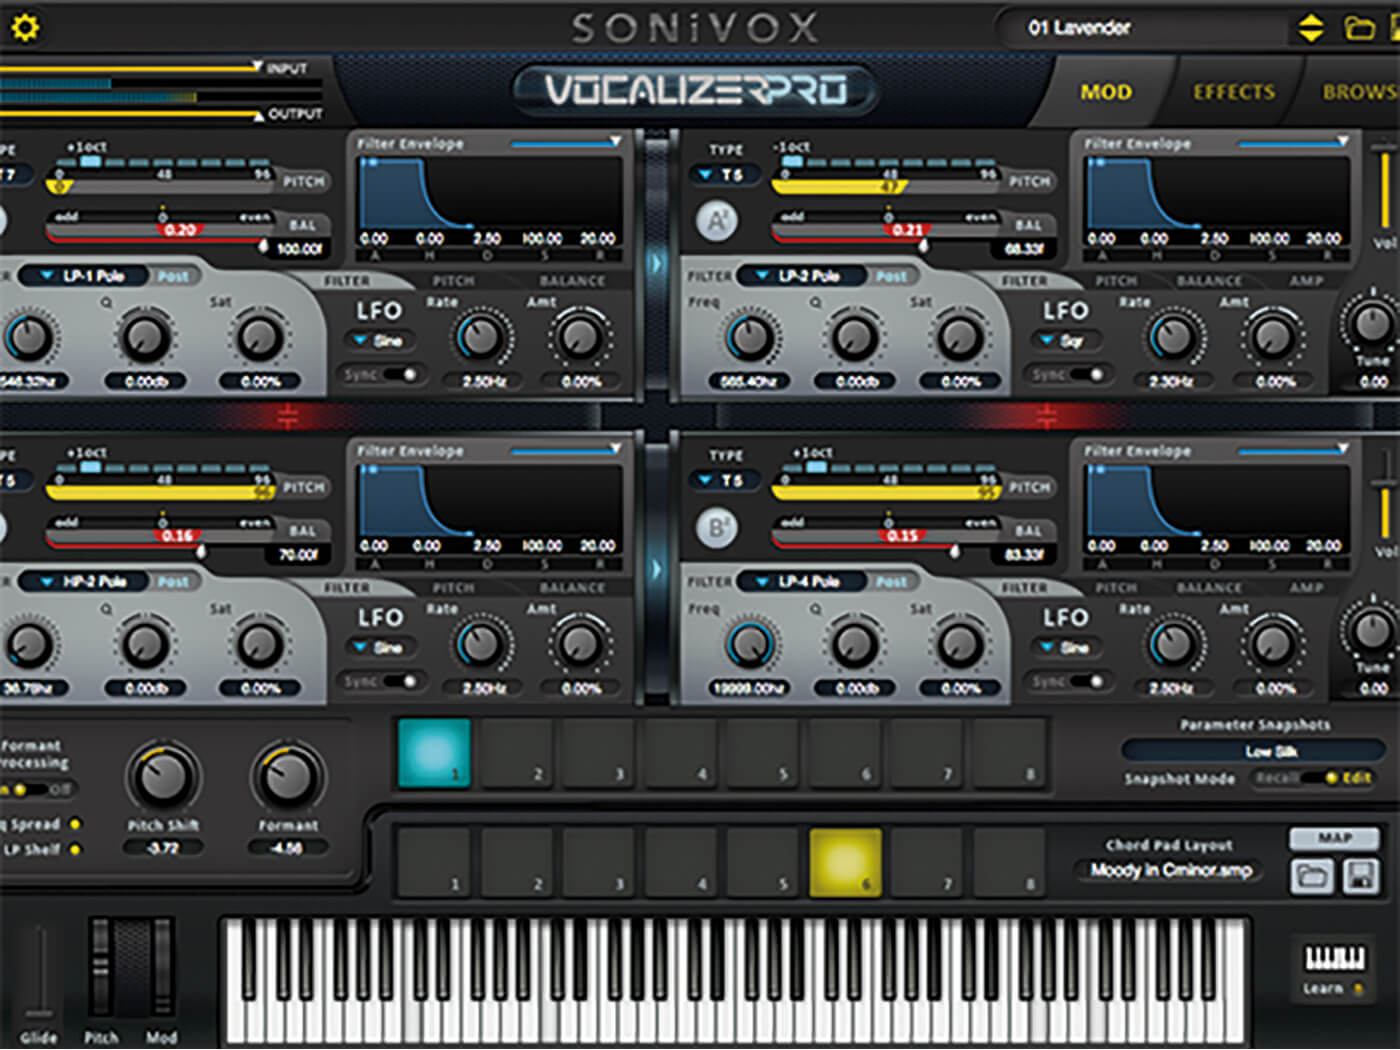 Sonivox Vocalizer Pro 1.3